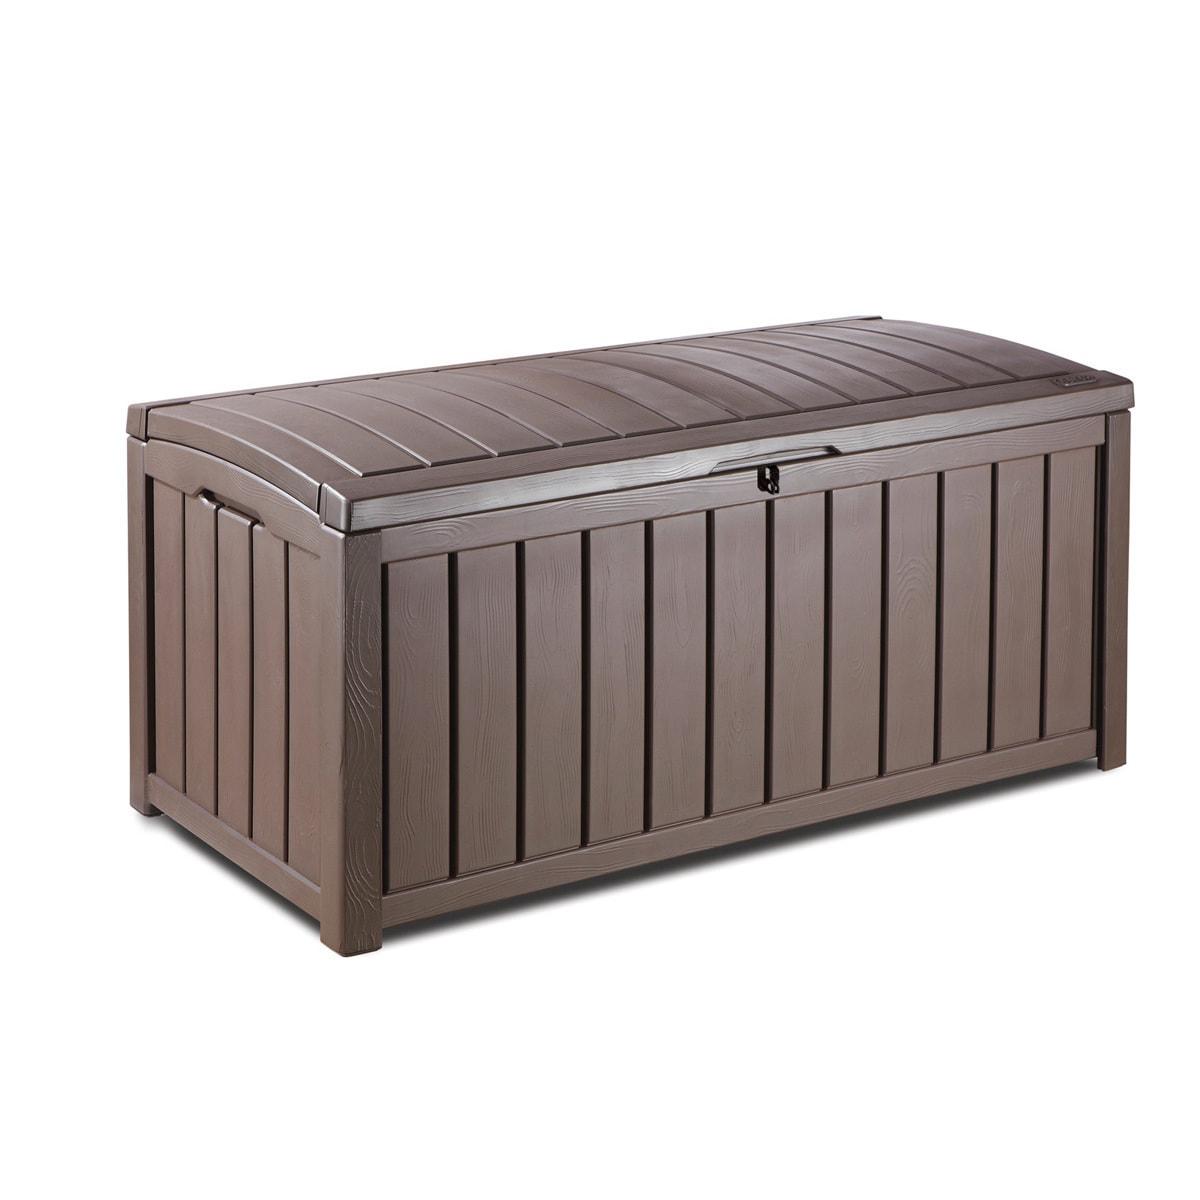 Keter Glenwood 101 Gal Brown Plastic Outdoor Patio Deck Storage Box